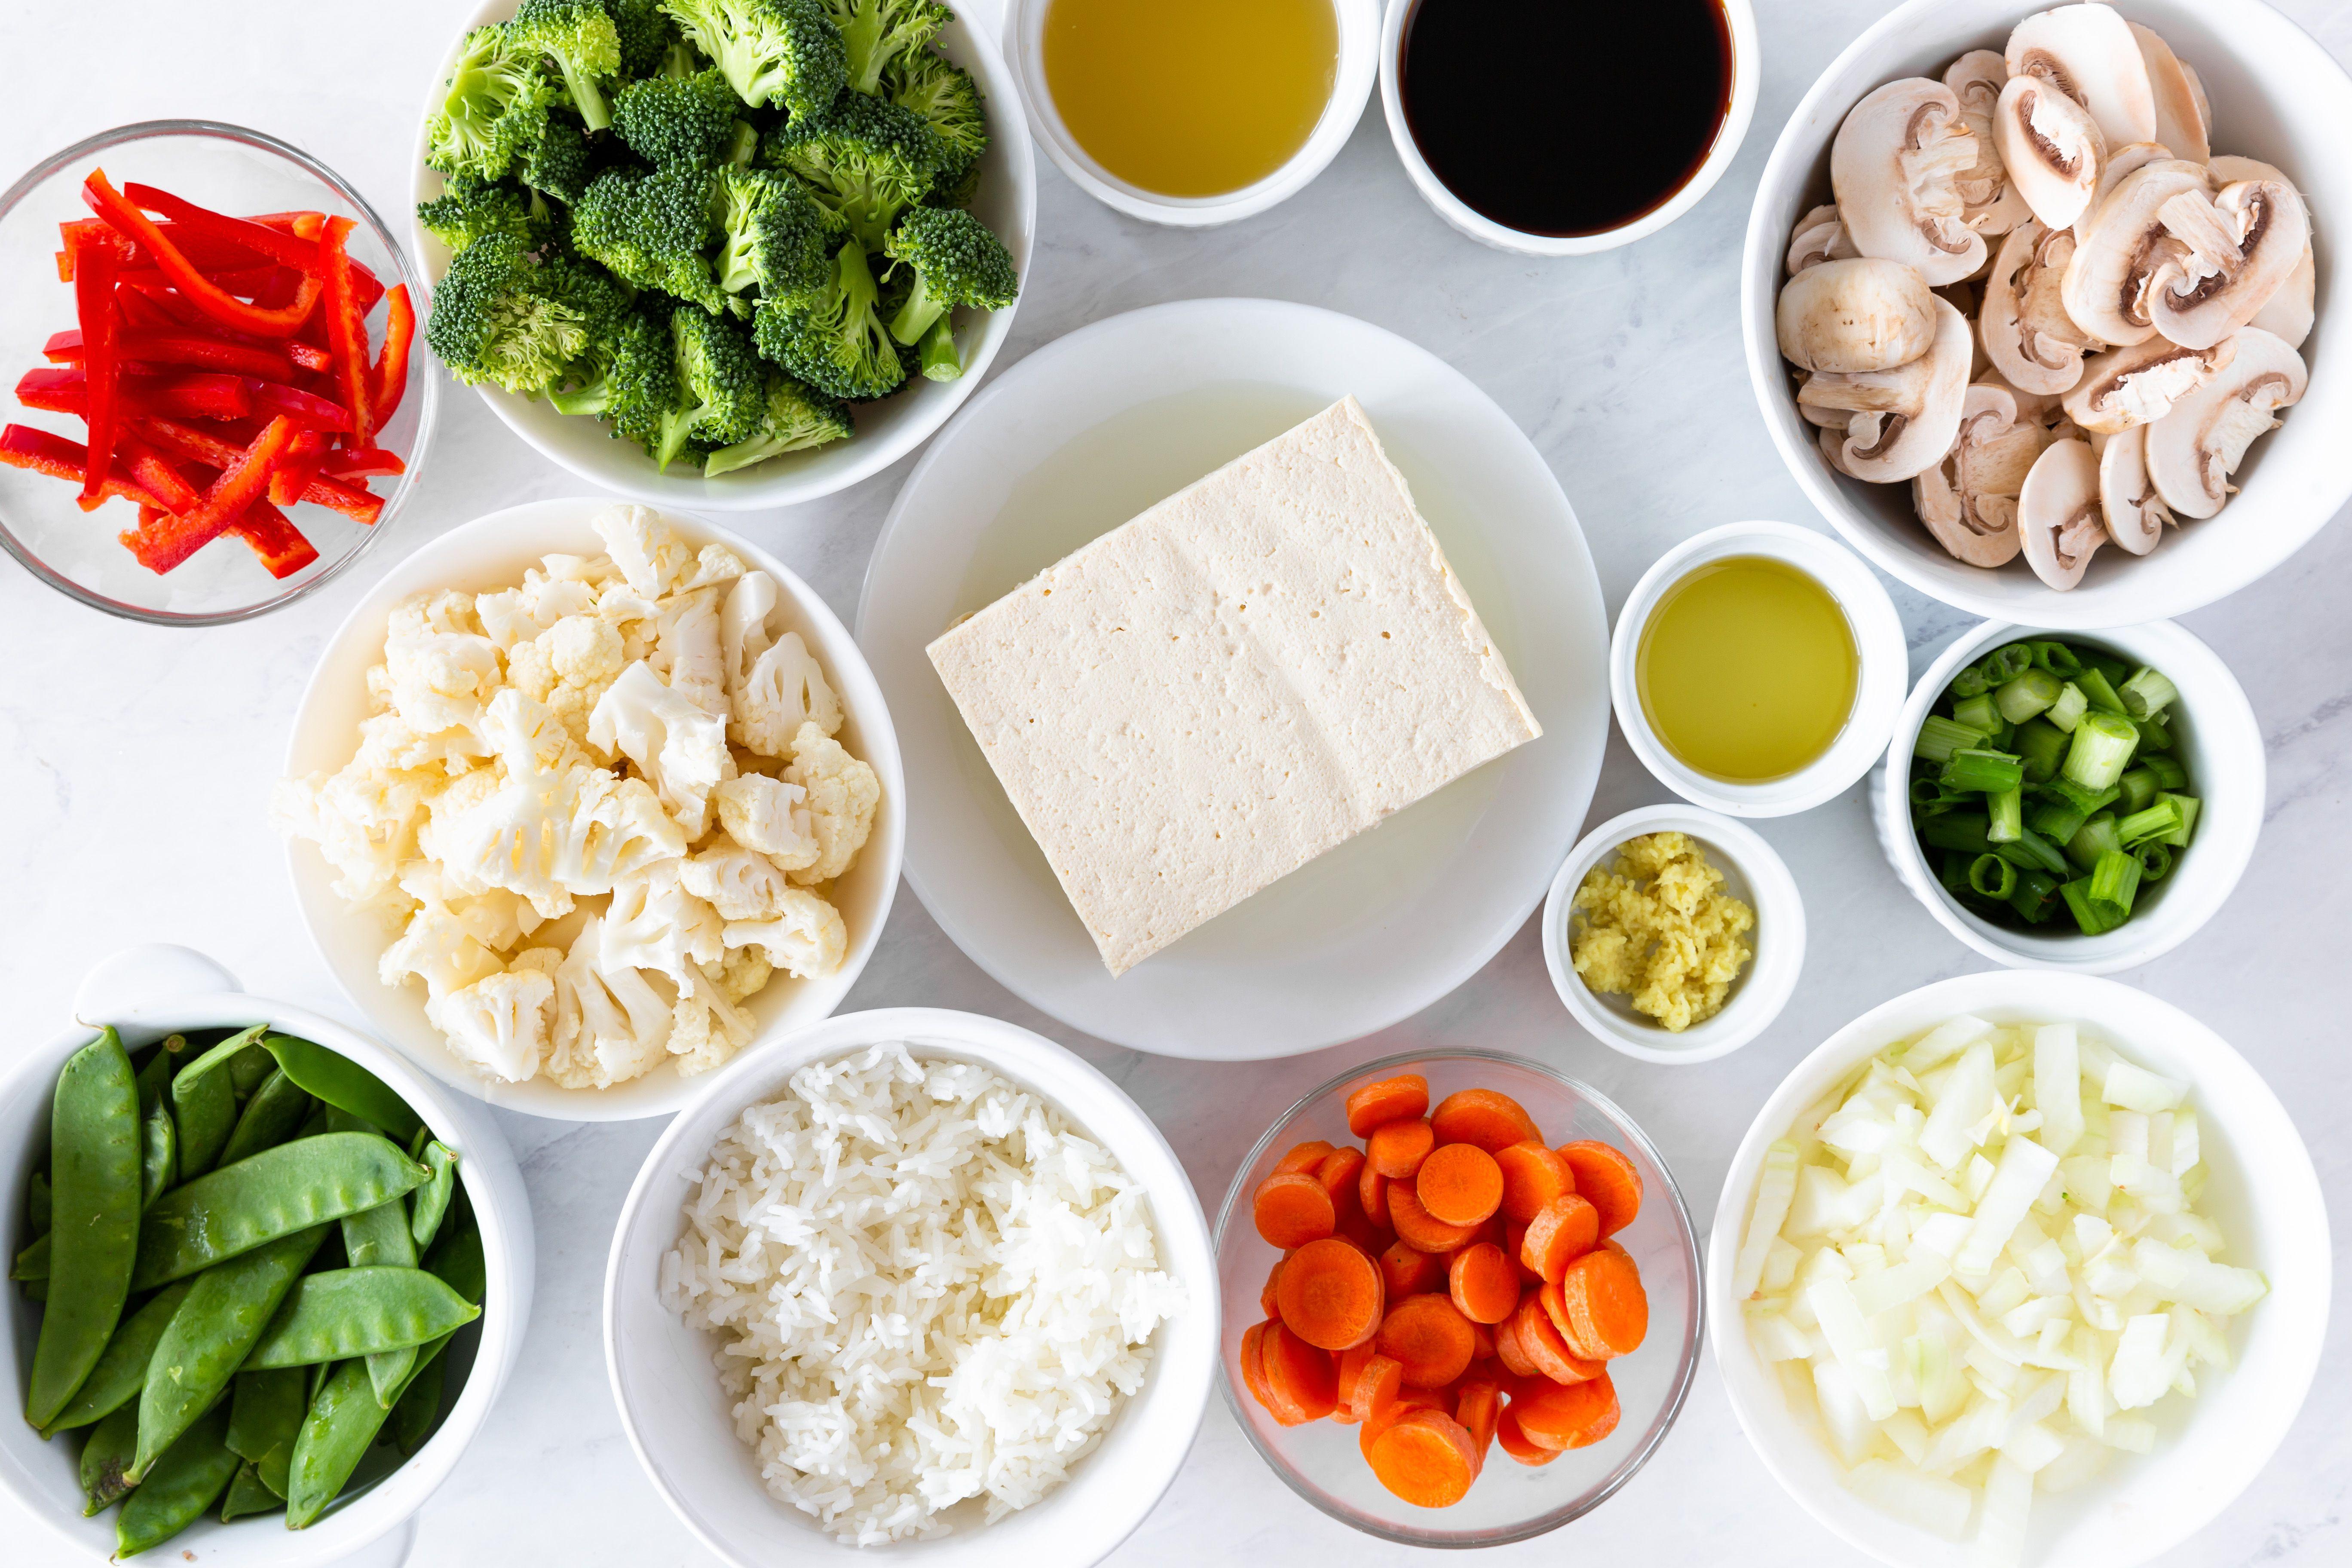 Ingredients for tofu veggie stir fry